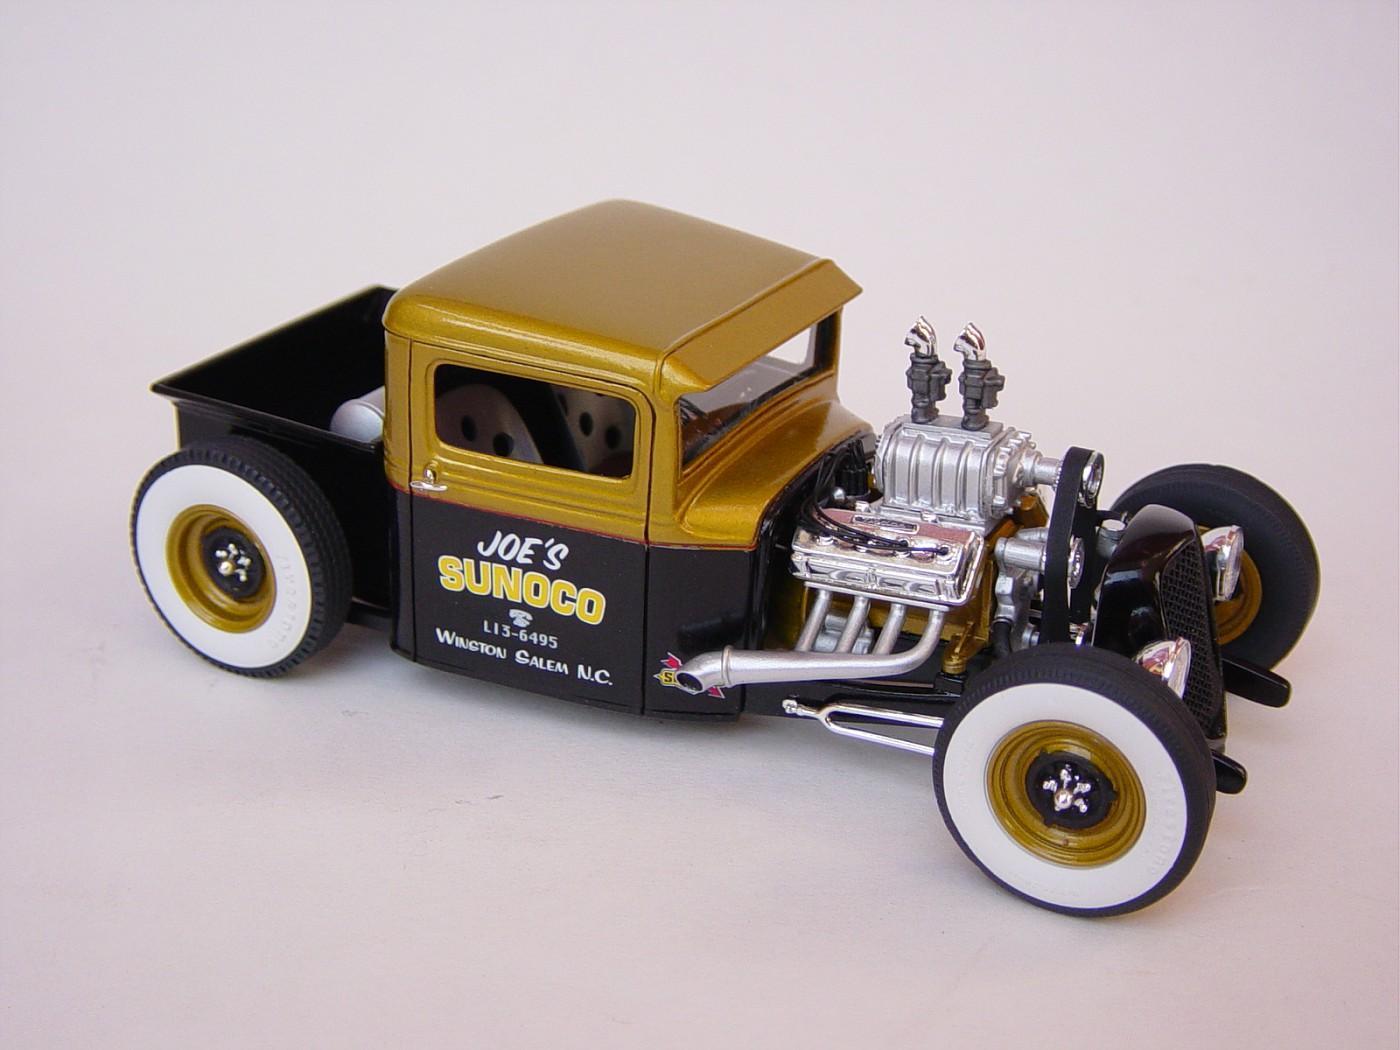 Joe's Sunoco '34 Pickup Shop Truck RF.jpg